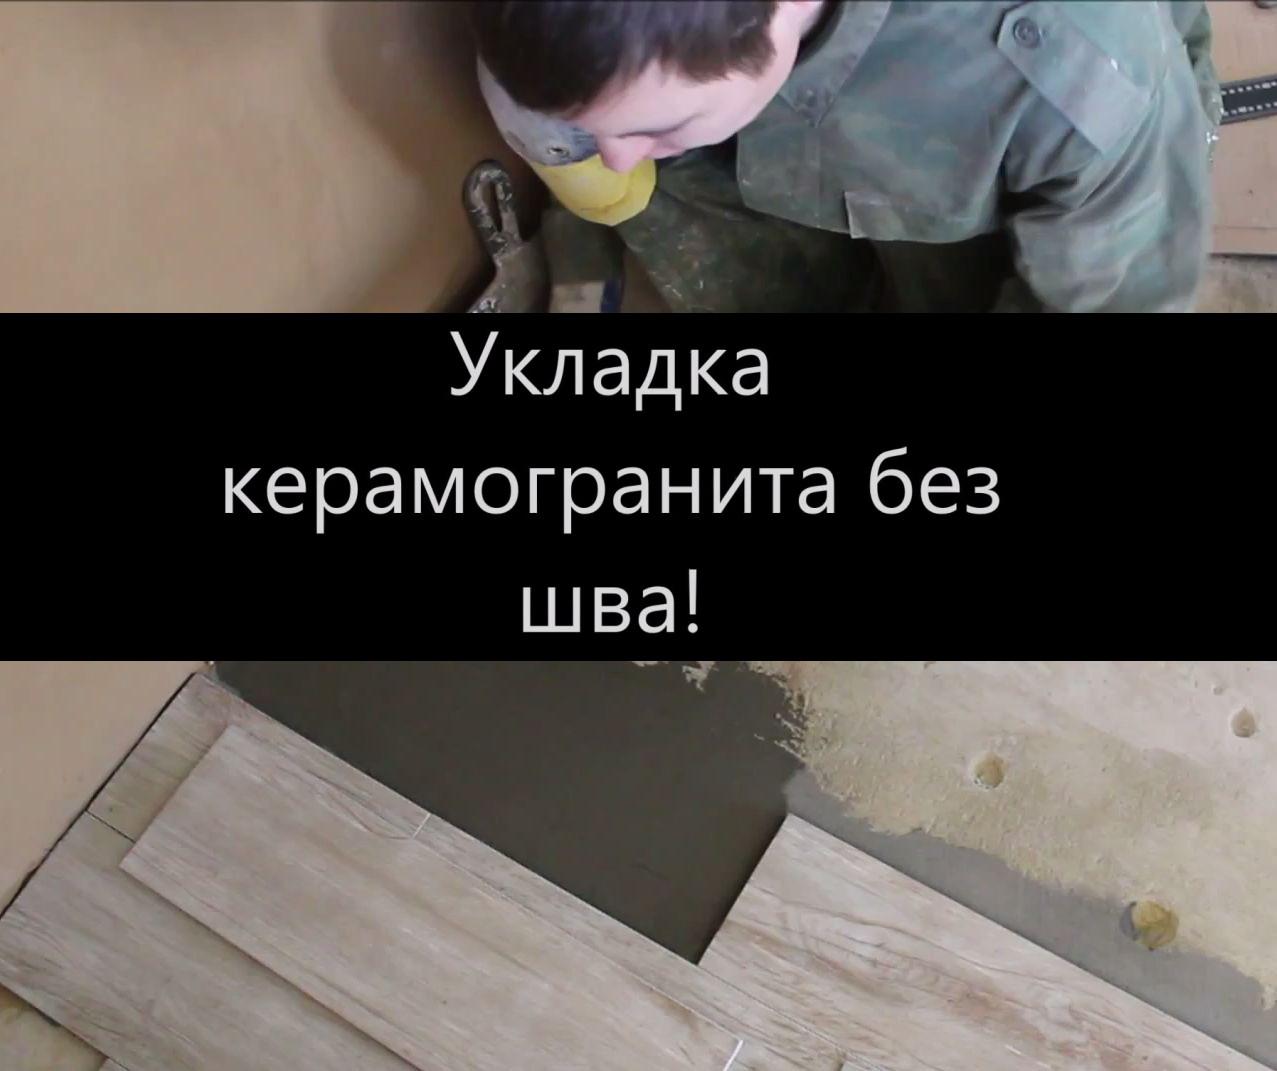 Укладка керамогранита без швов своими руками